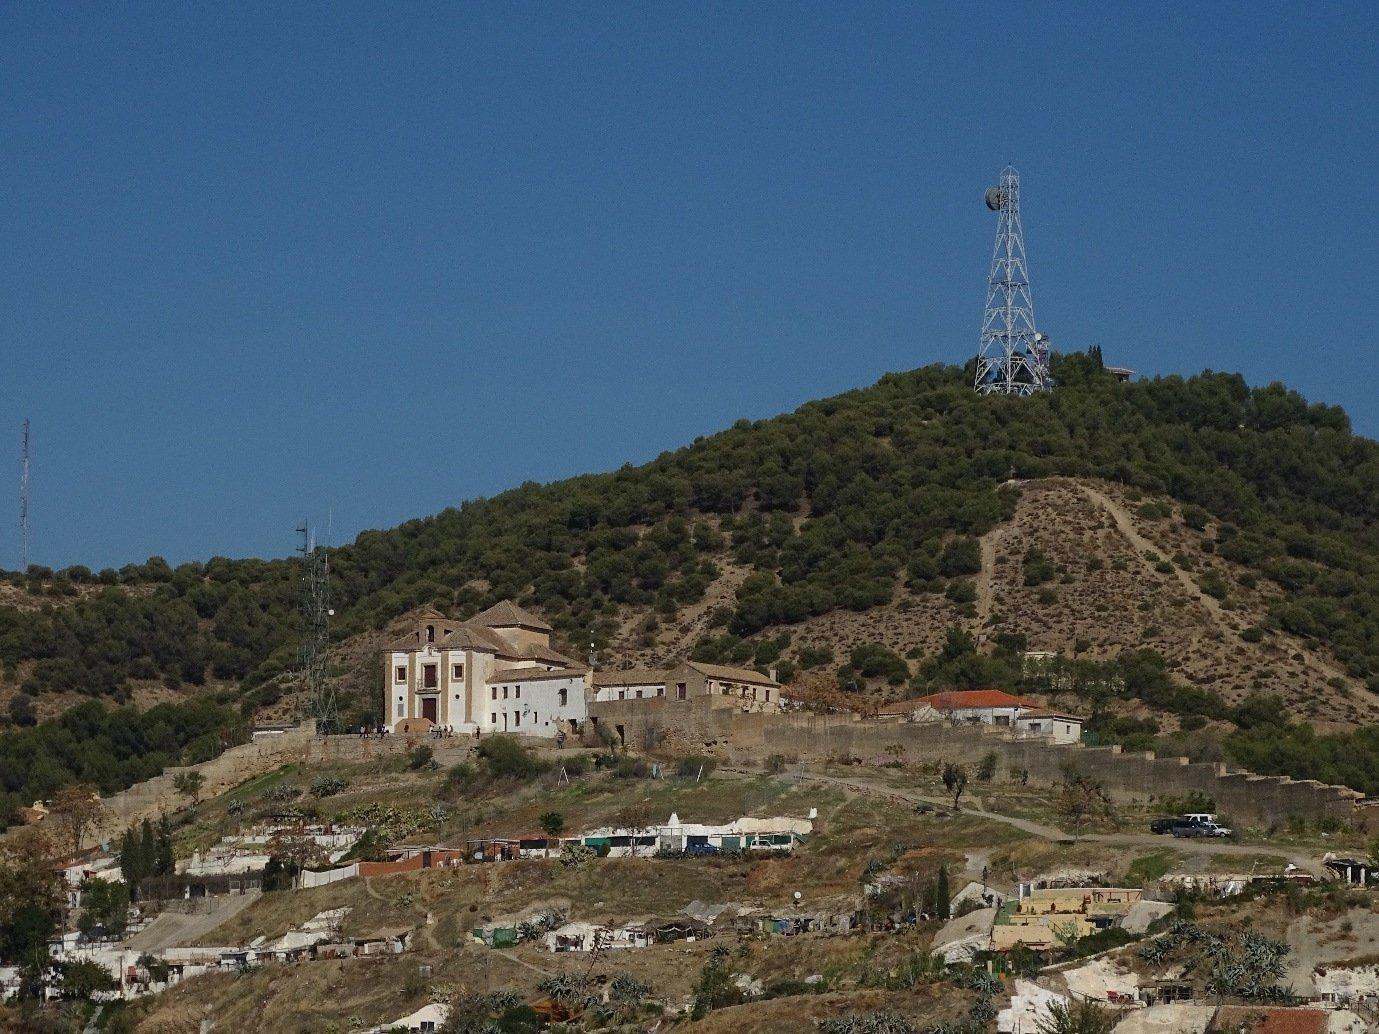 Albaicín hill with the Mirador San Miguel Alto monastery and viewpoint